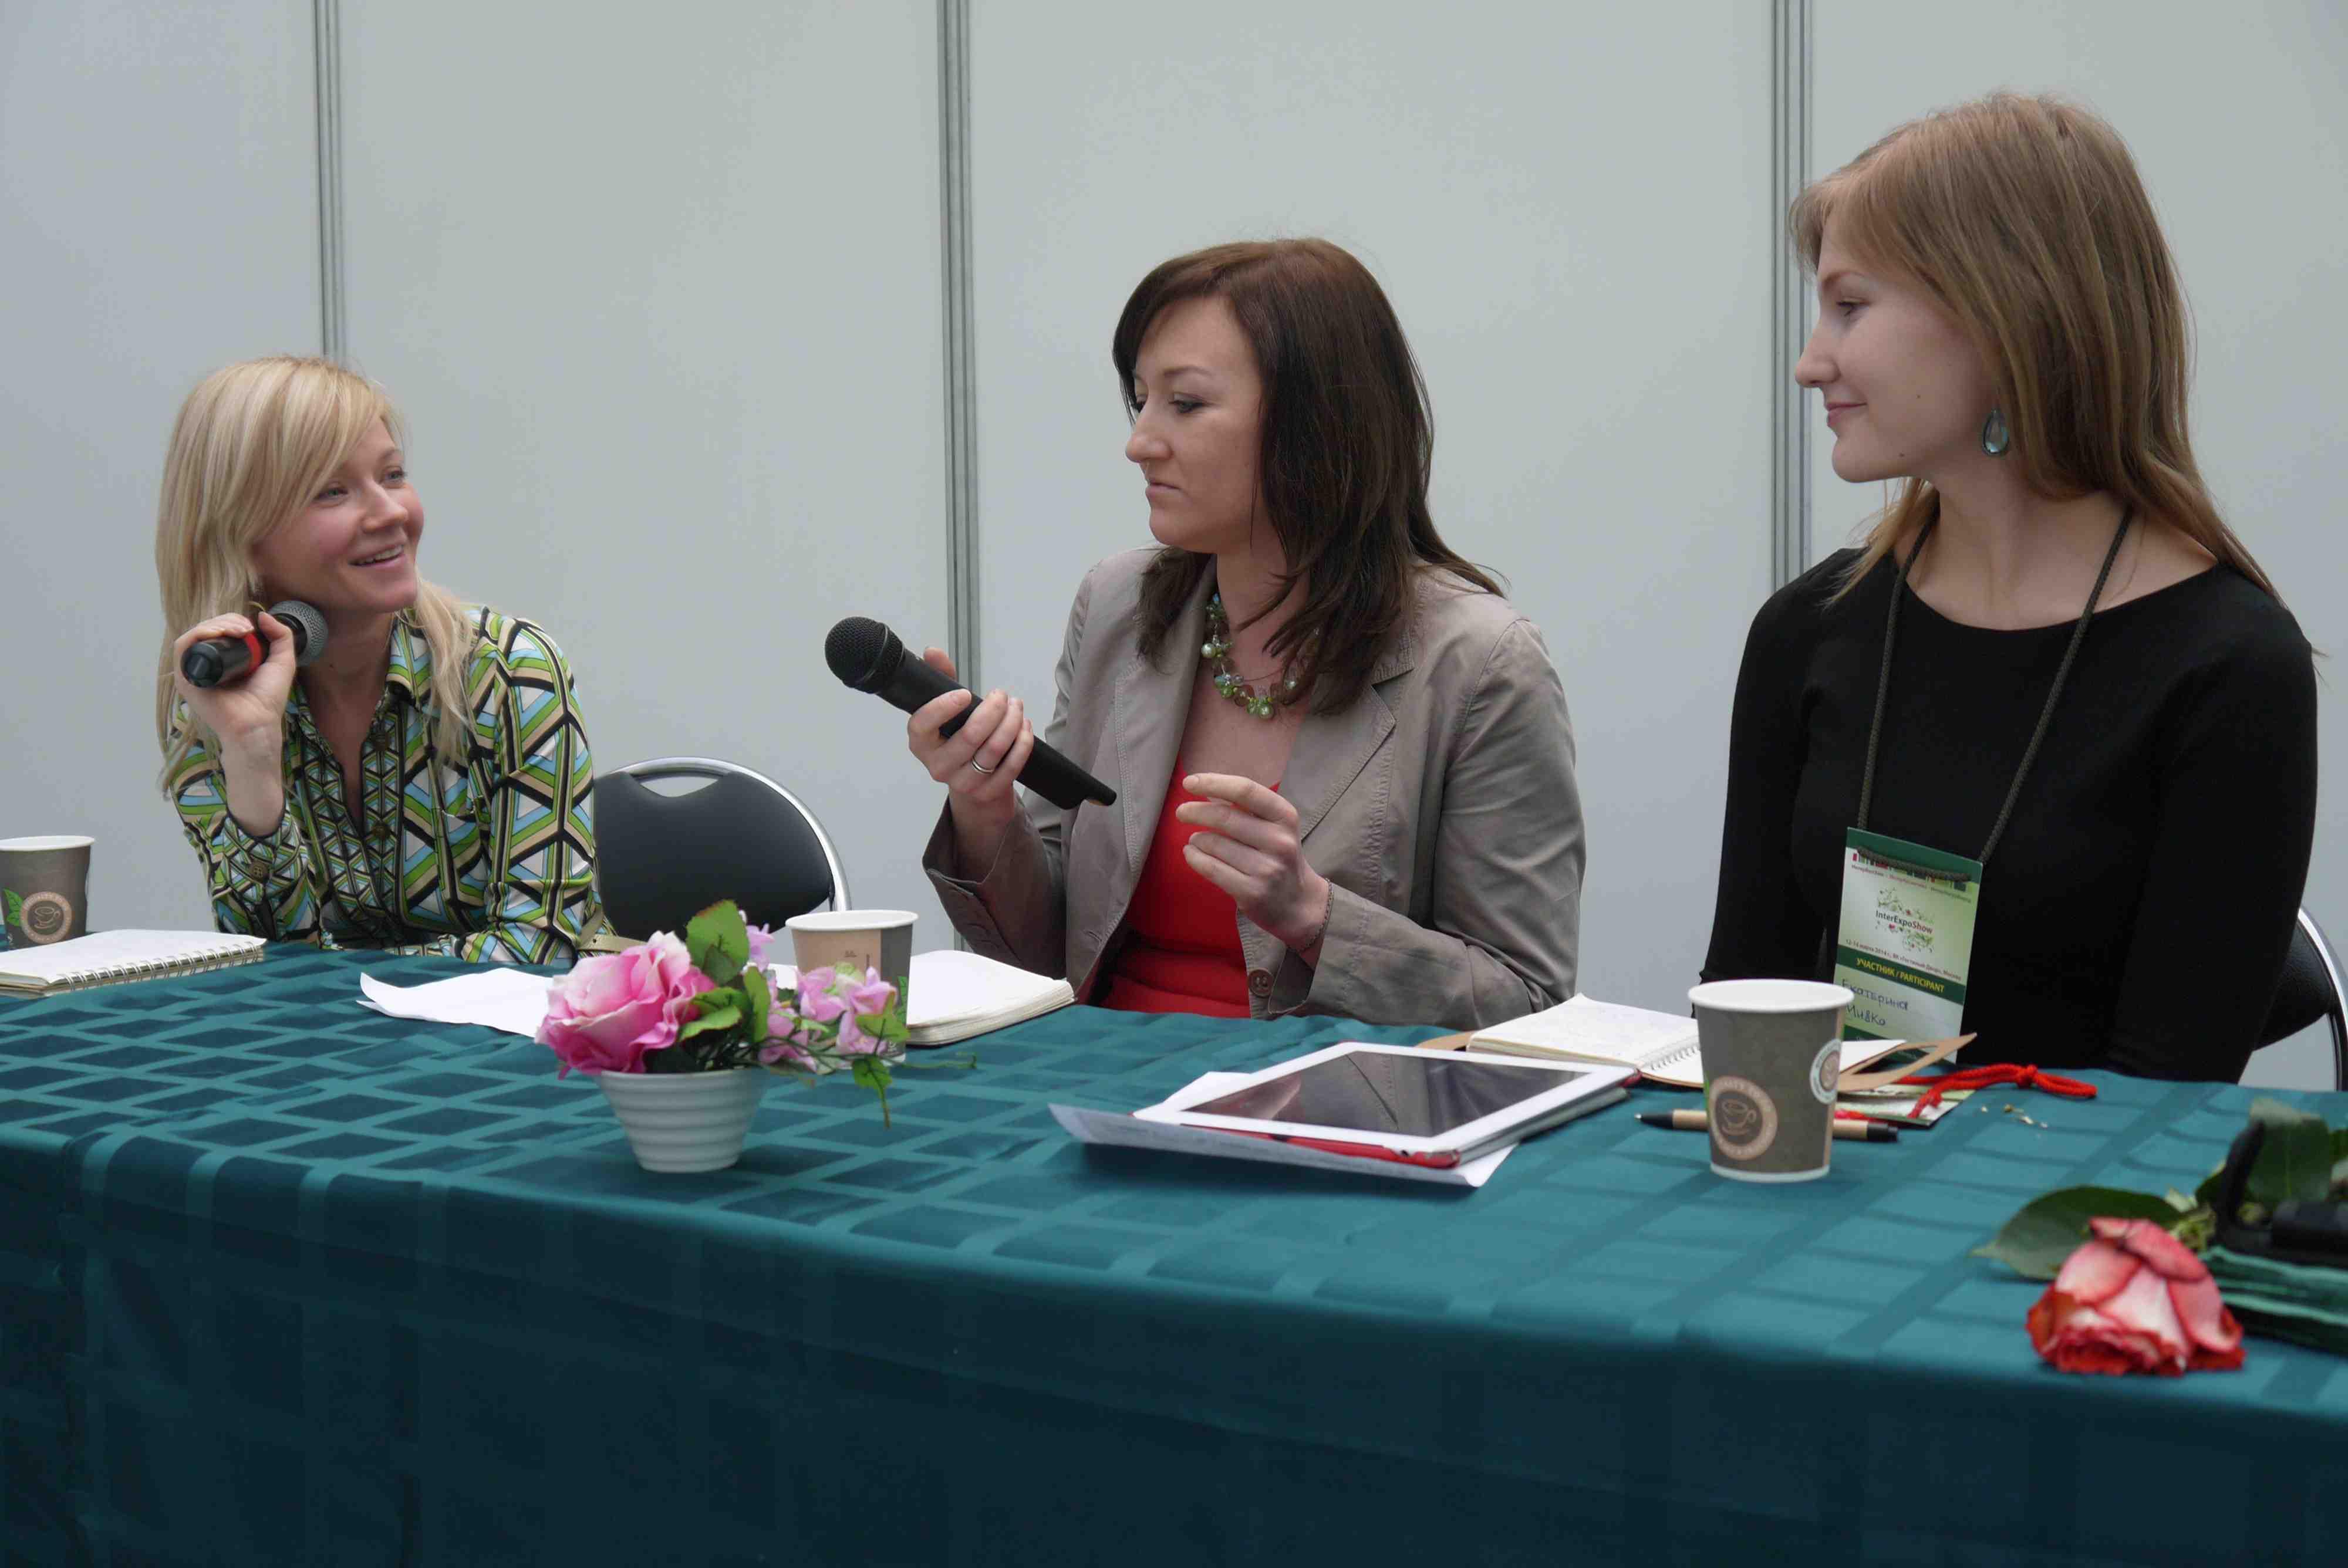 Слева направо: Татьяна Лебедева (LookBio), Оксана Ицкова (Botanicalife), Екатерина Матанцева (МиКо)